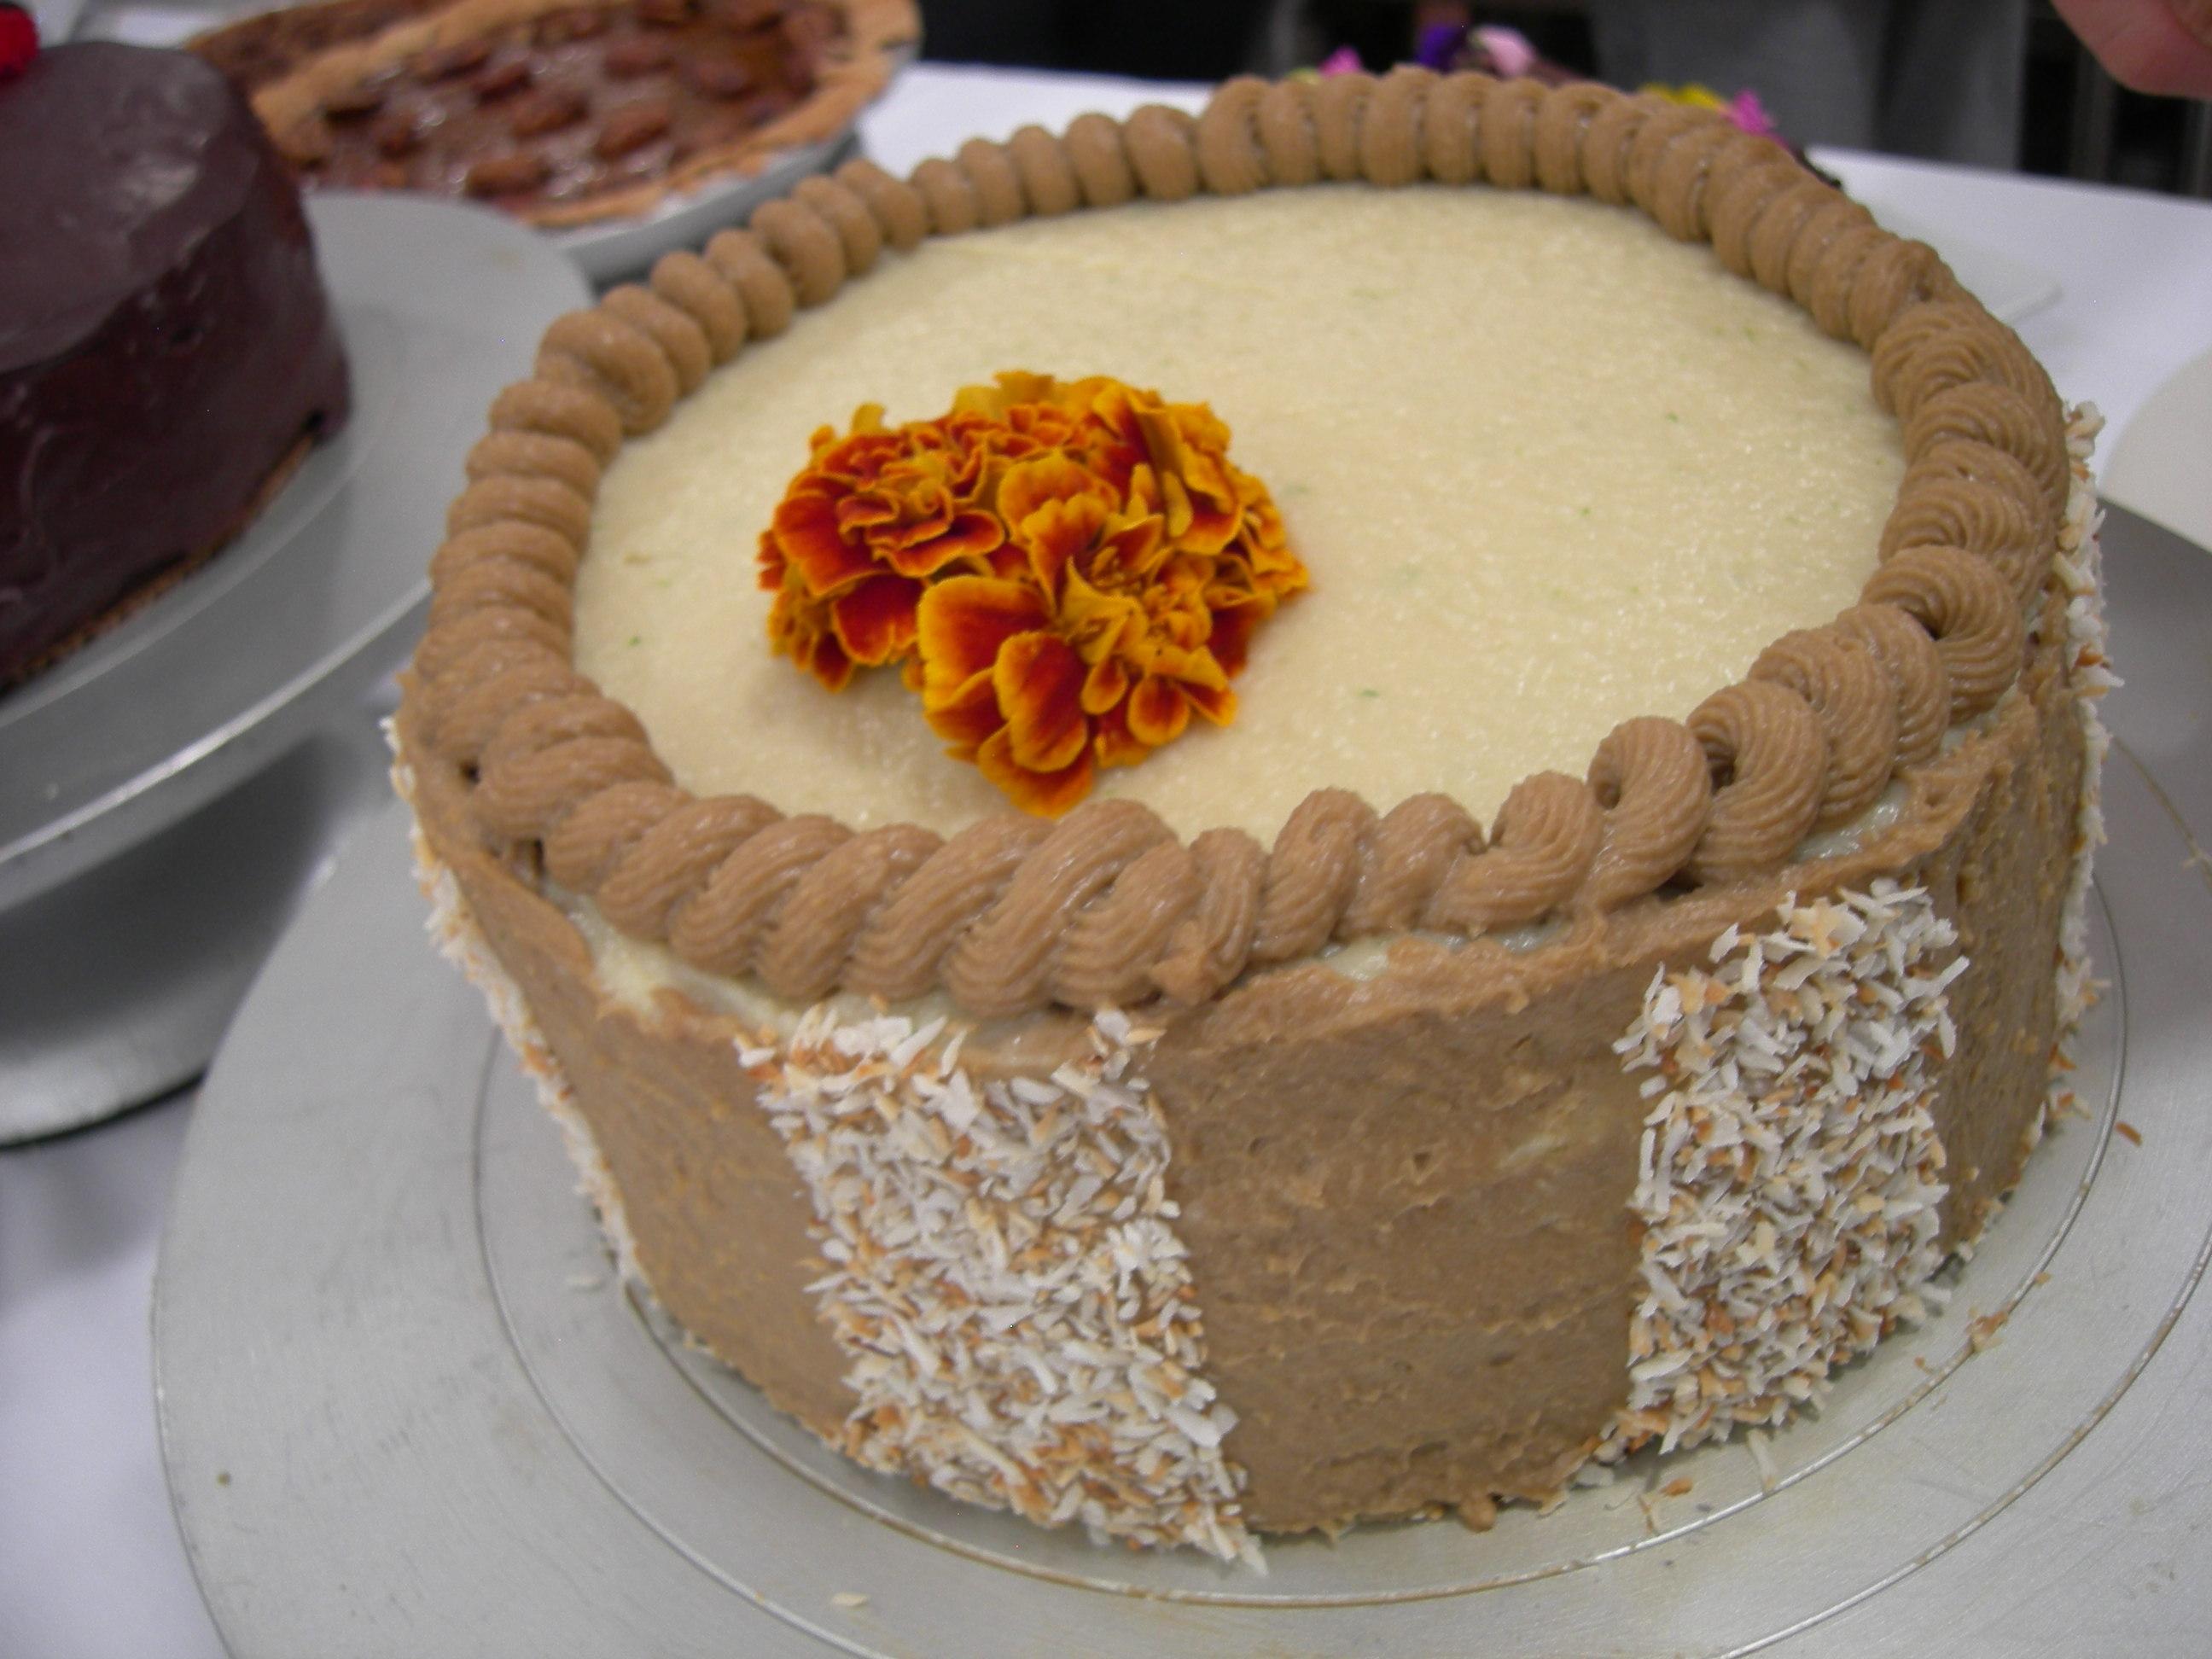 Versatile Vanilla Cake with Coconut Pecan Filling